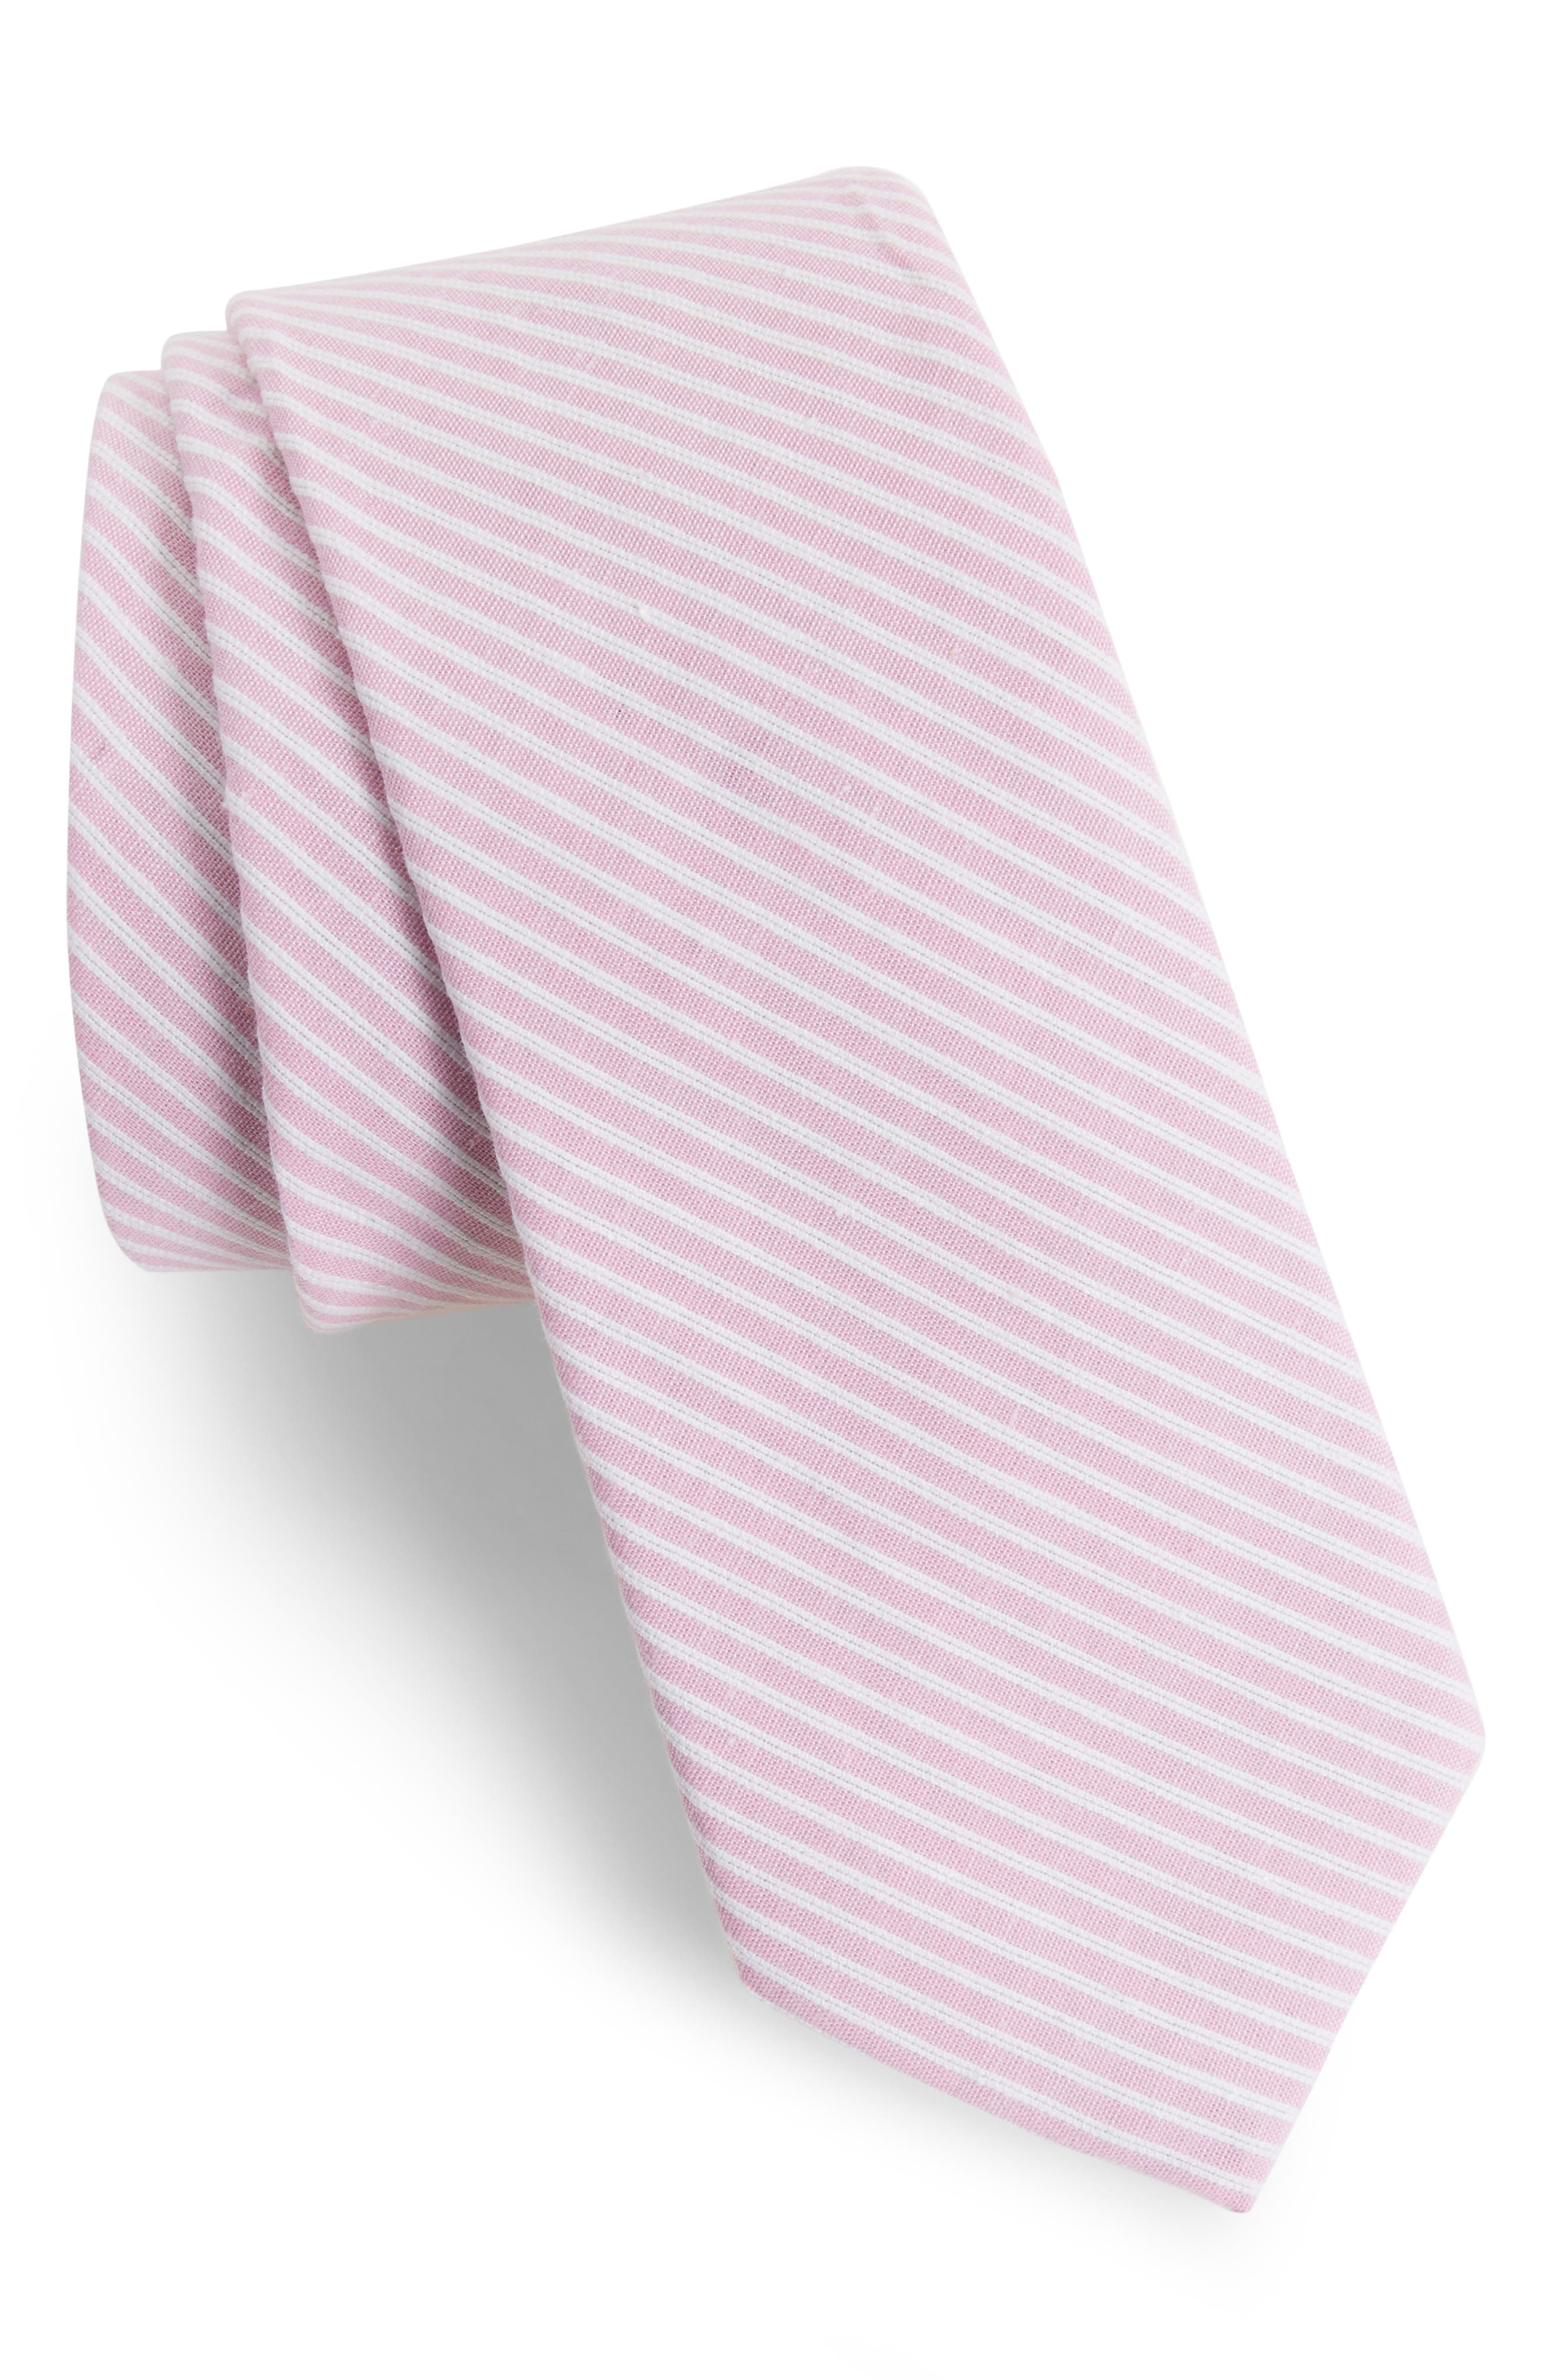 Alternate Image 1 Selected - Nordstrom Men's Shop Kenton Stripe Cotton Tie